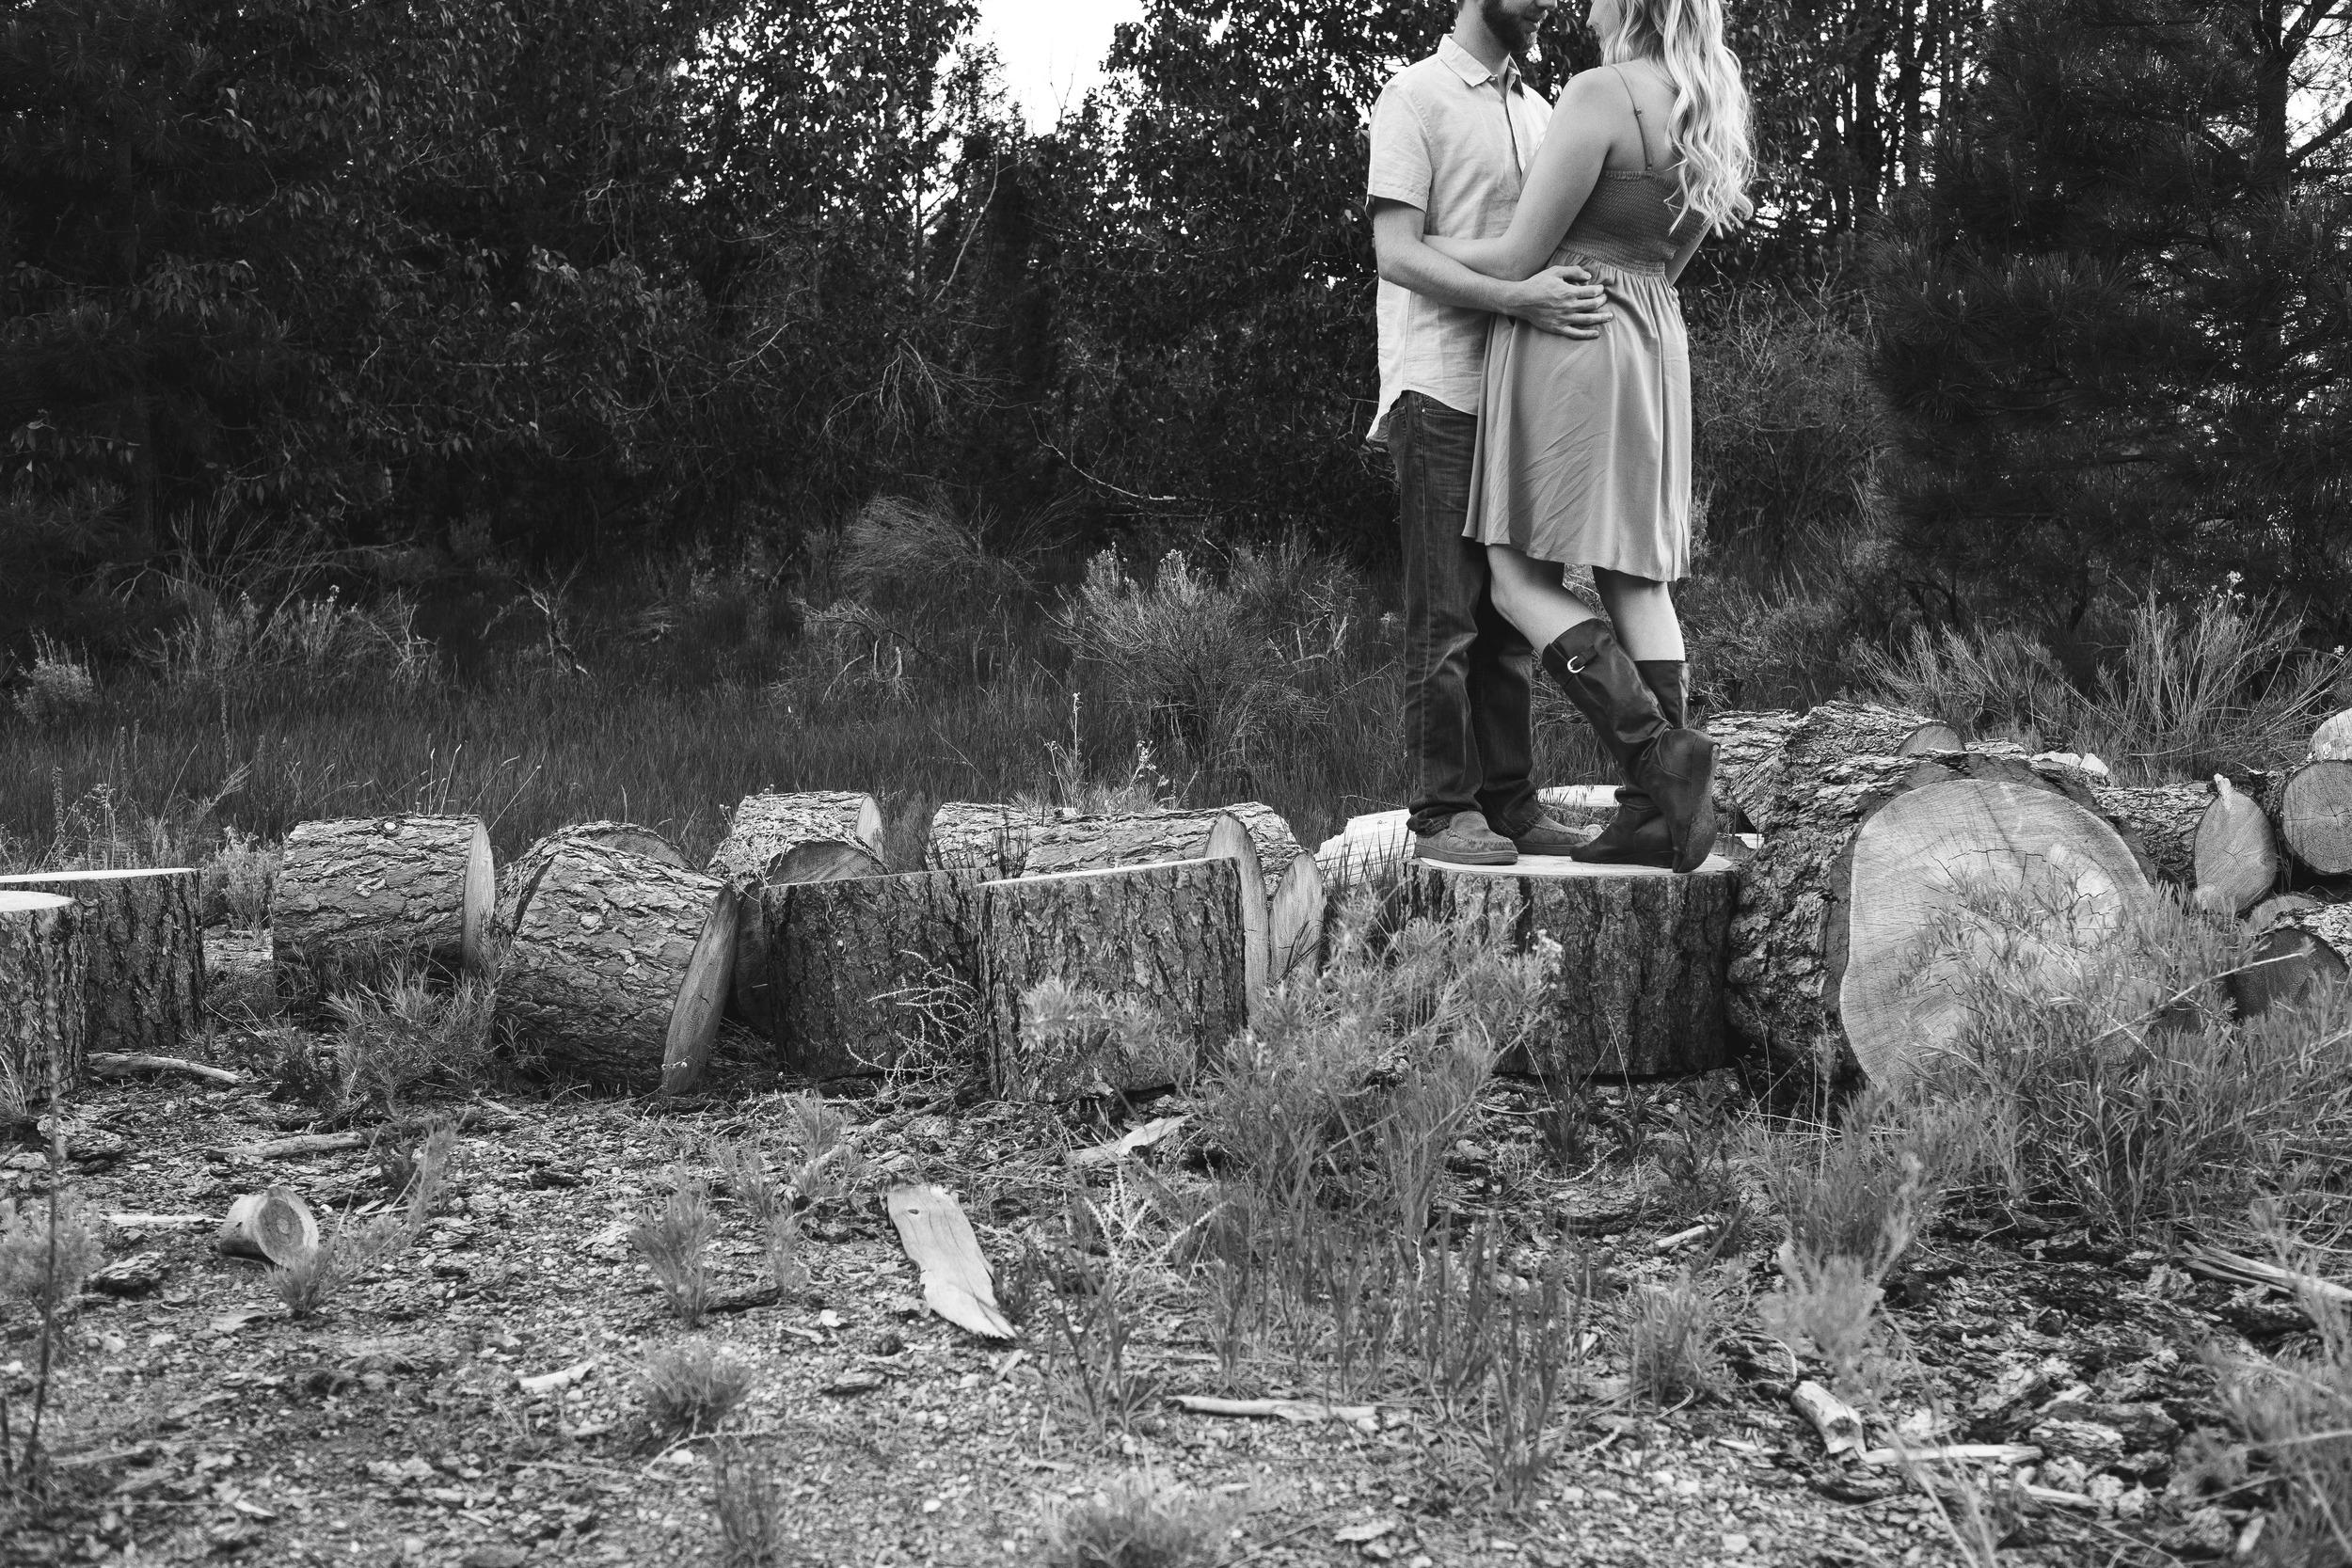 Black and White chopped wood pile photography couple